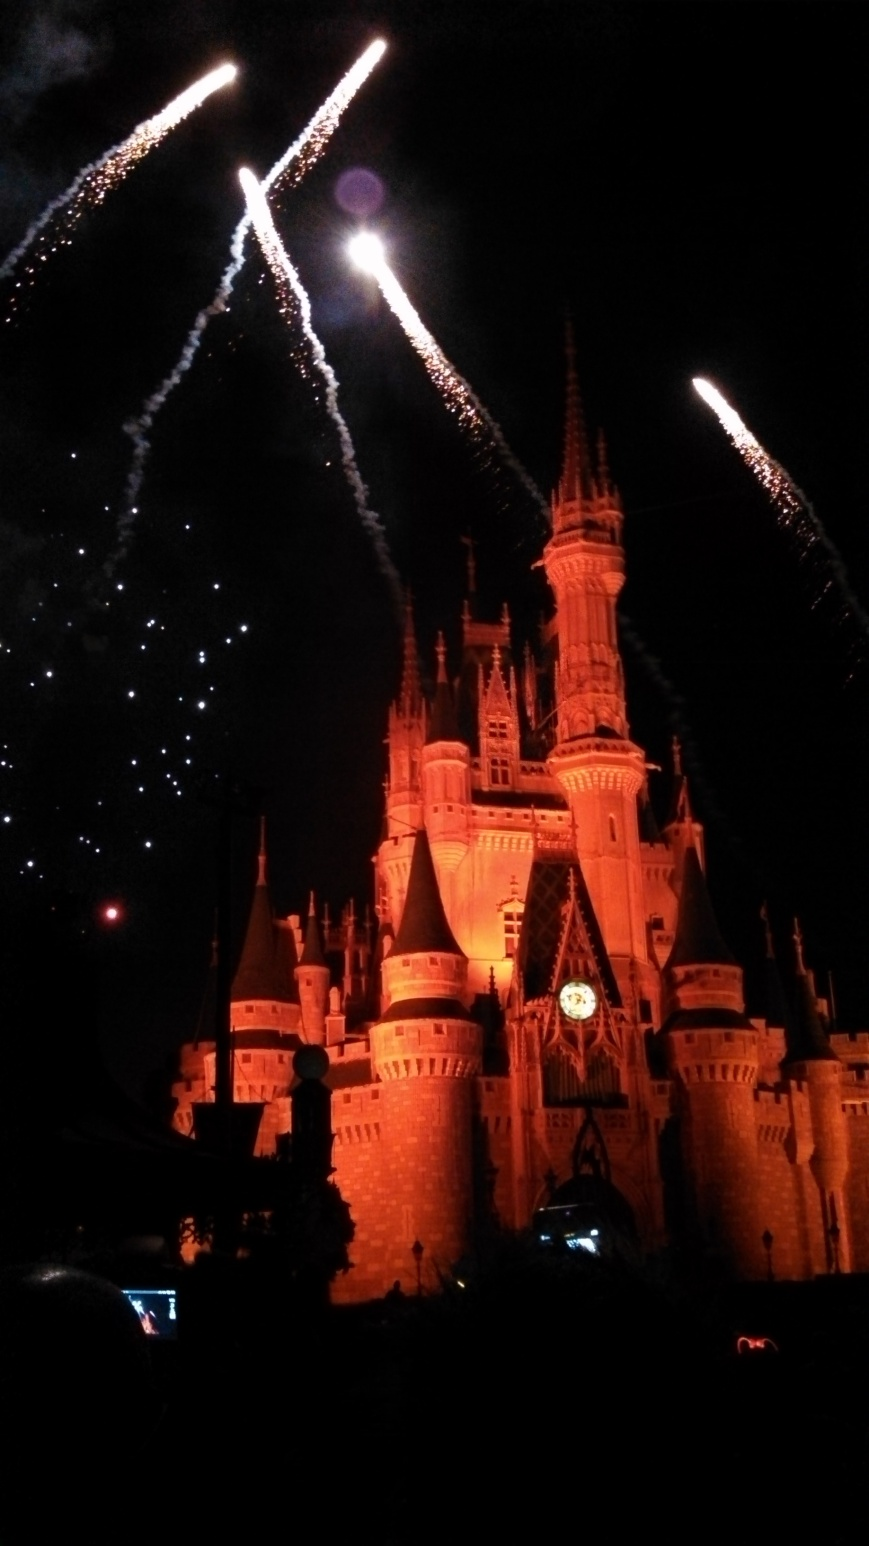 Nothing beats fireworks like Disney's fireworks:)